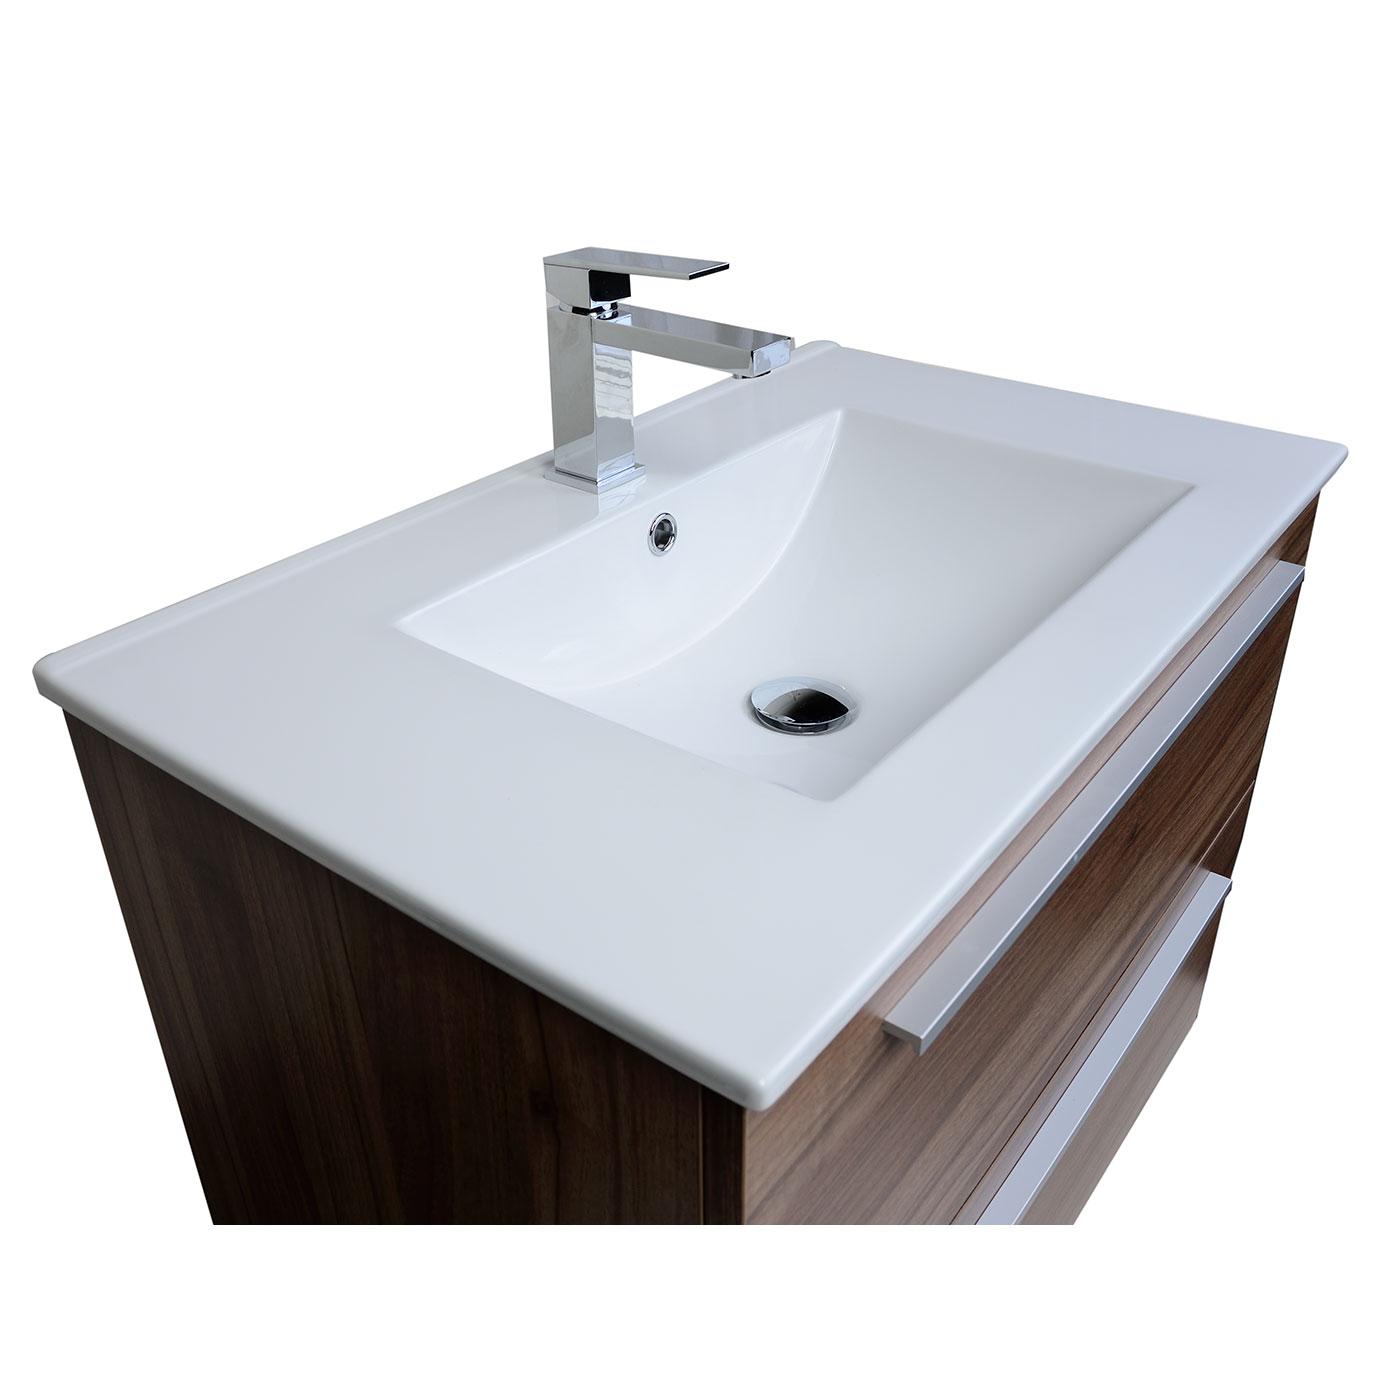 "Buy Nola 29 5"" Wall Mount Modern Bathroom Vanity Walnut TN T750C WN on C"